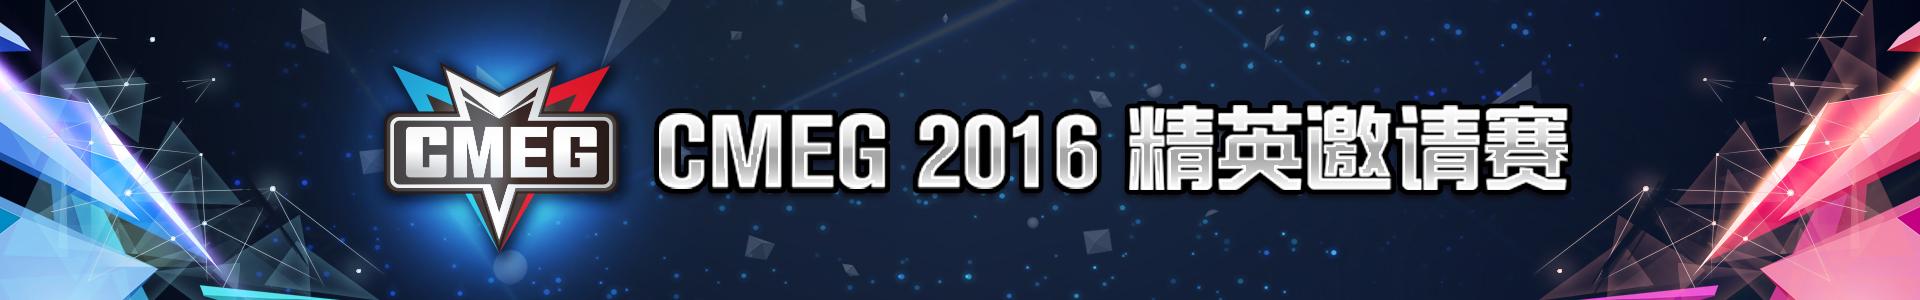 CMEG 2016精英邀请赛现场直播 着迷带你一起见证年终王者